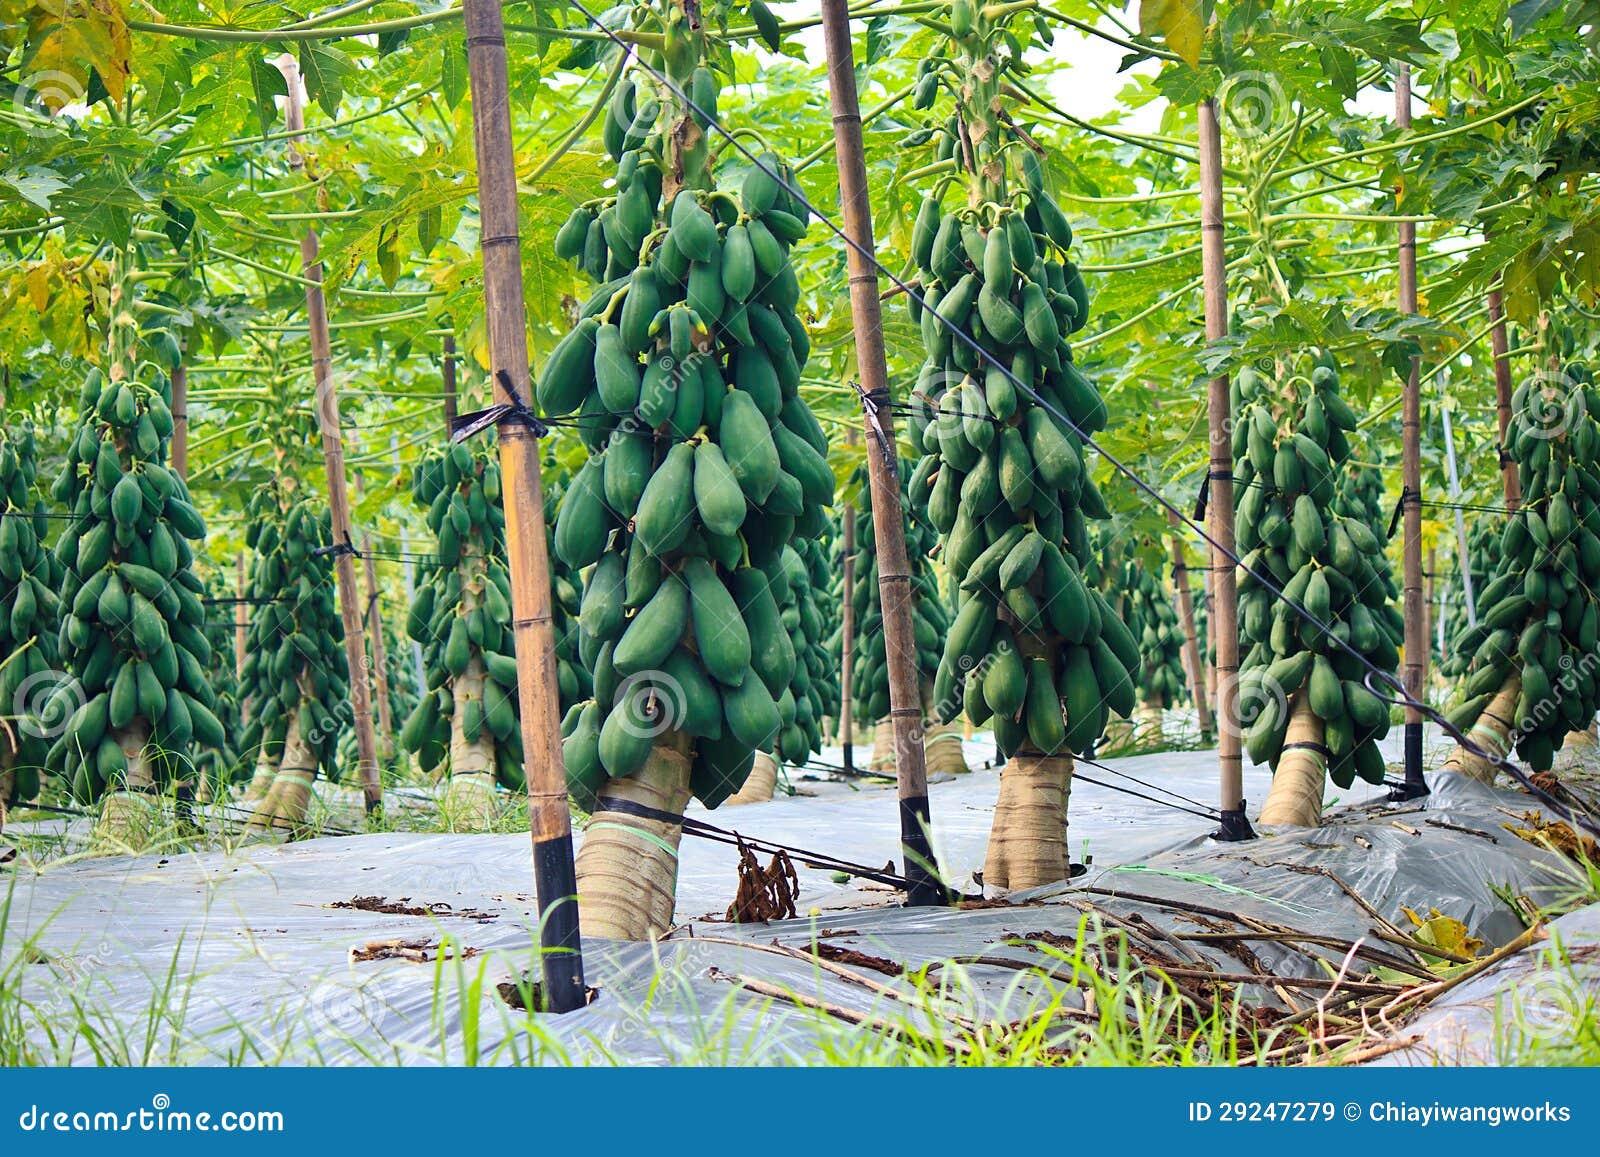 cultivation-papaya-29247279.jpg